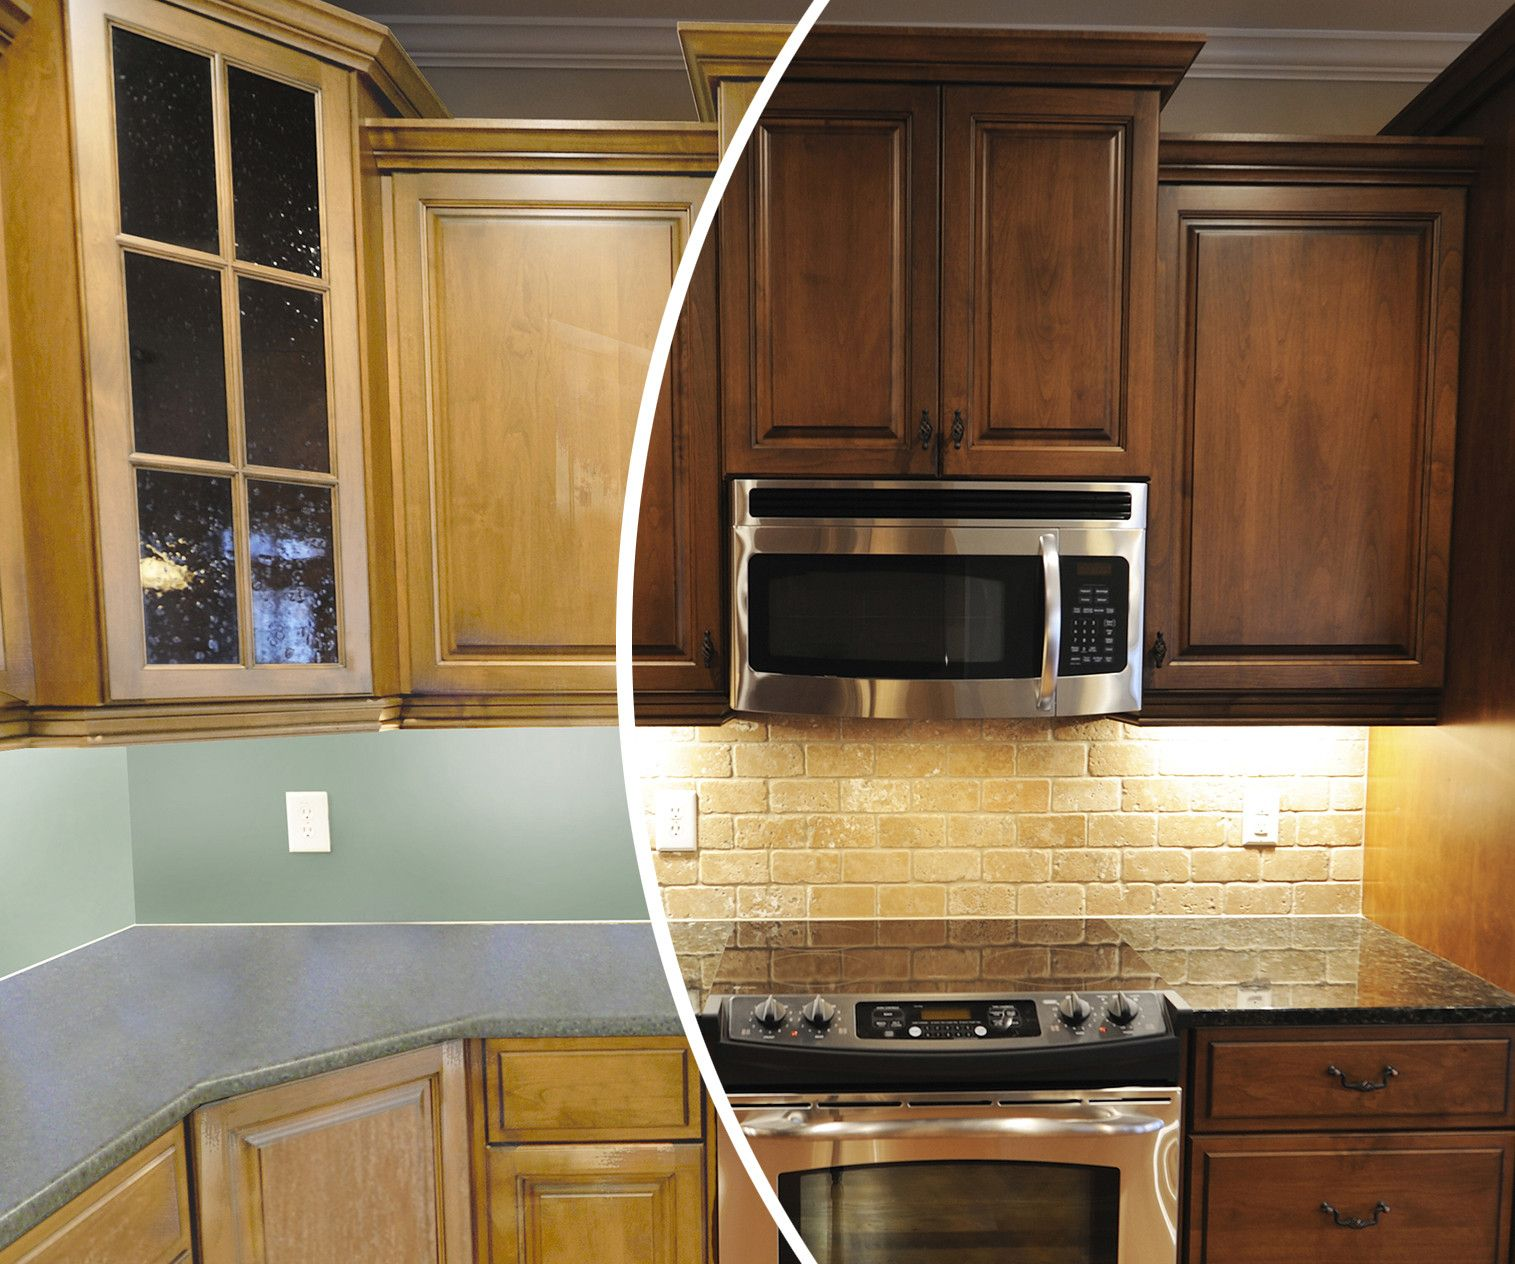 Best Kitchen Gallery: 70 Cabi Refacing Madison Wi Kitchen Cabi S Countertops Ideas of Kitchen Cabinets Madison Wi on rachelxblog.com